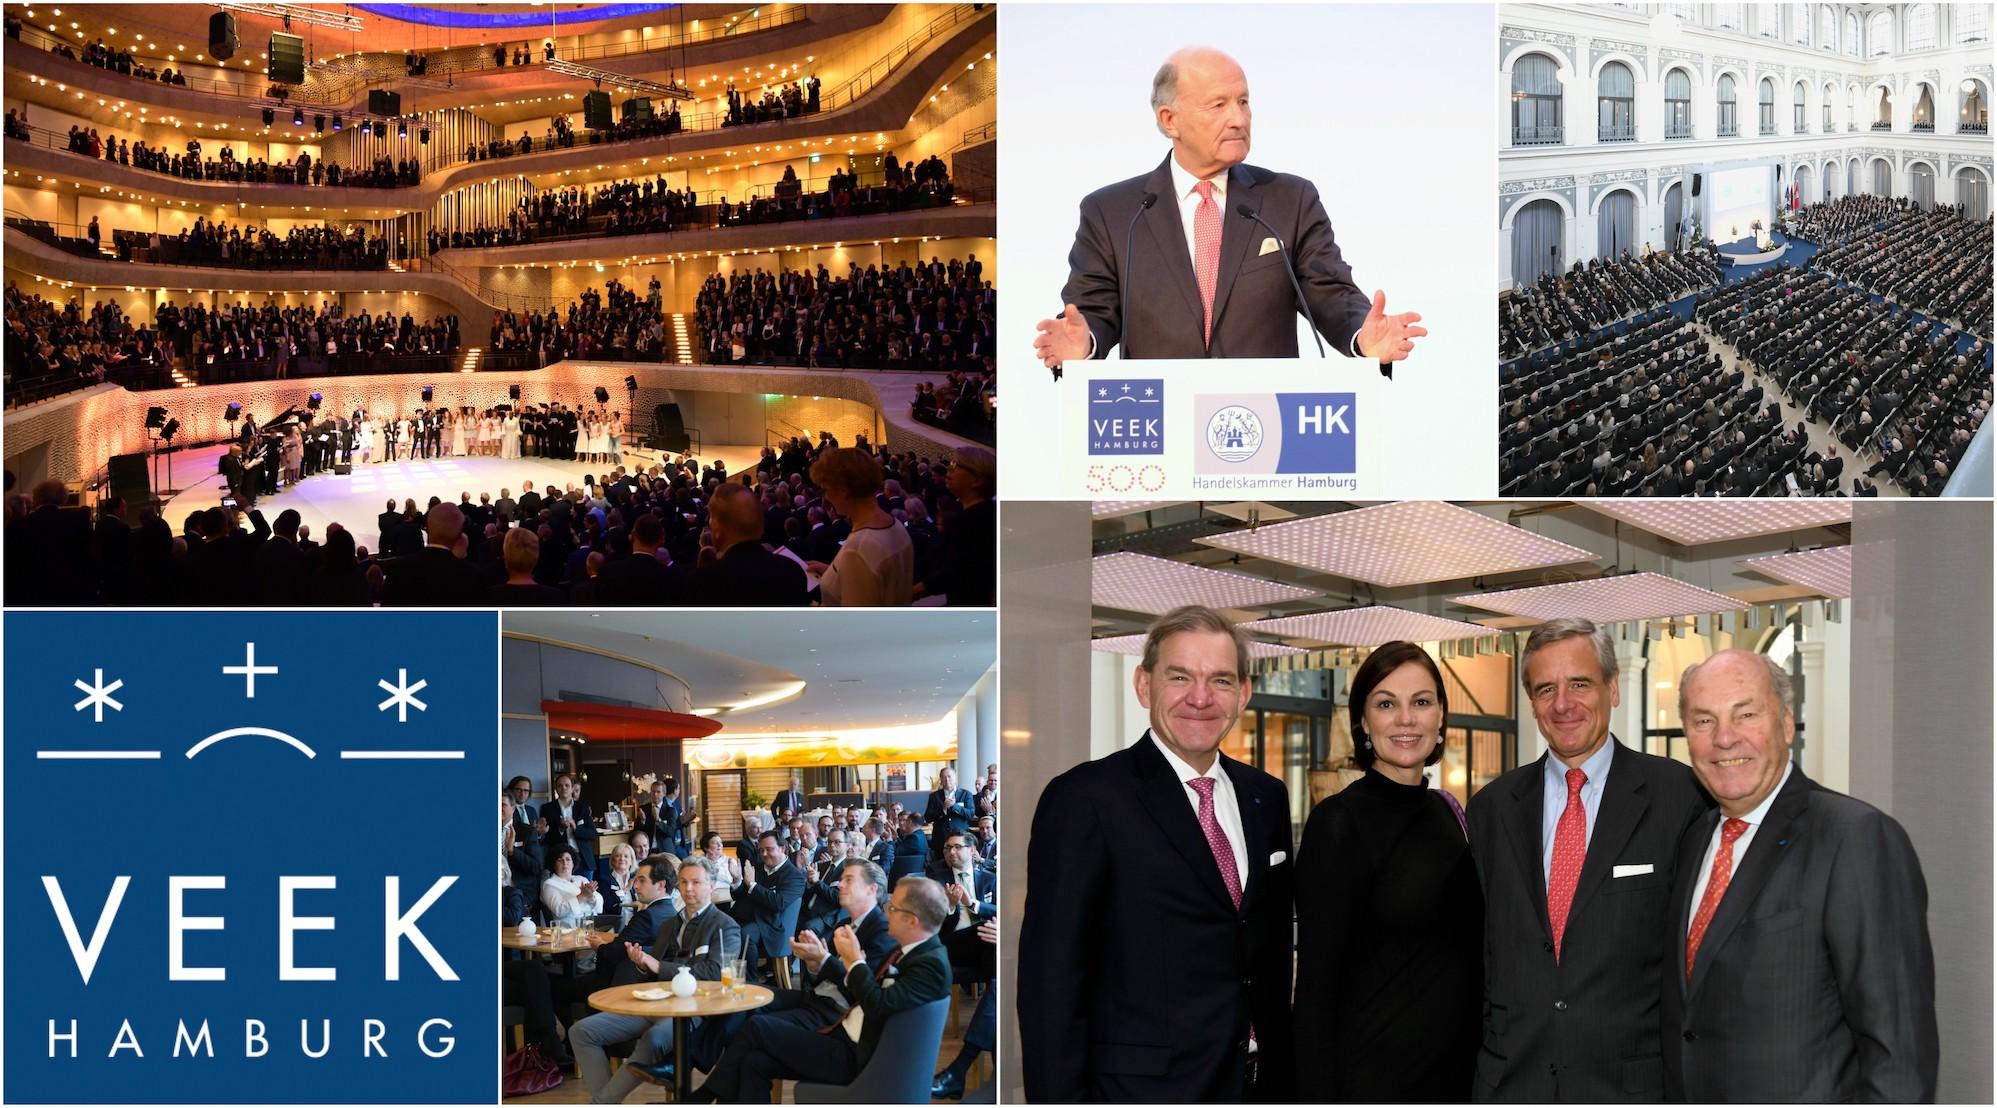 Fotos: VEEK e.V., Handelskammer, Ulrich Perrey, Astrid Möller,Melanie Gibbat, Michael Zapf, Stephan Walloca